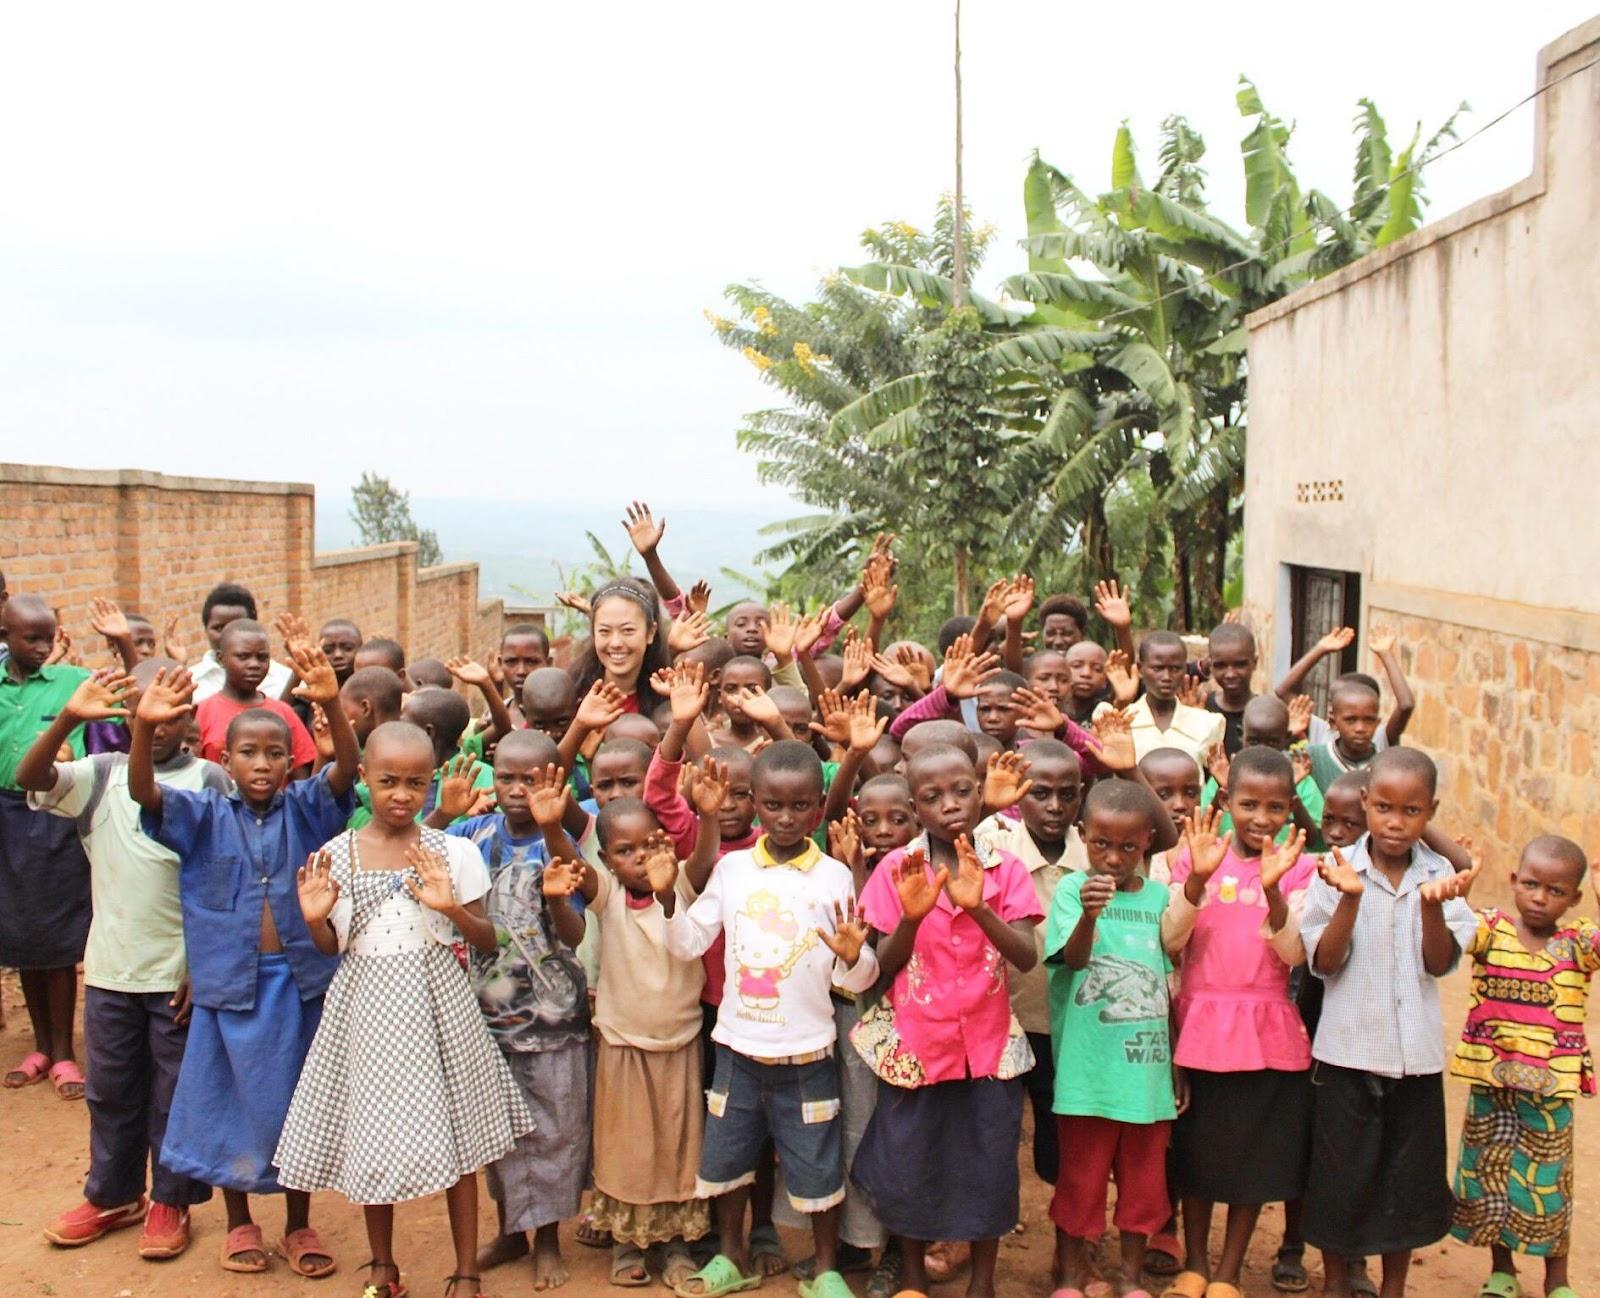 Mission Trip, Rwanda